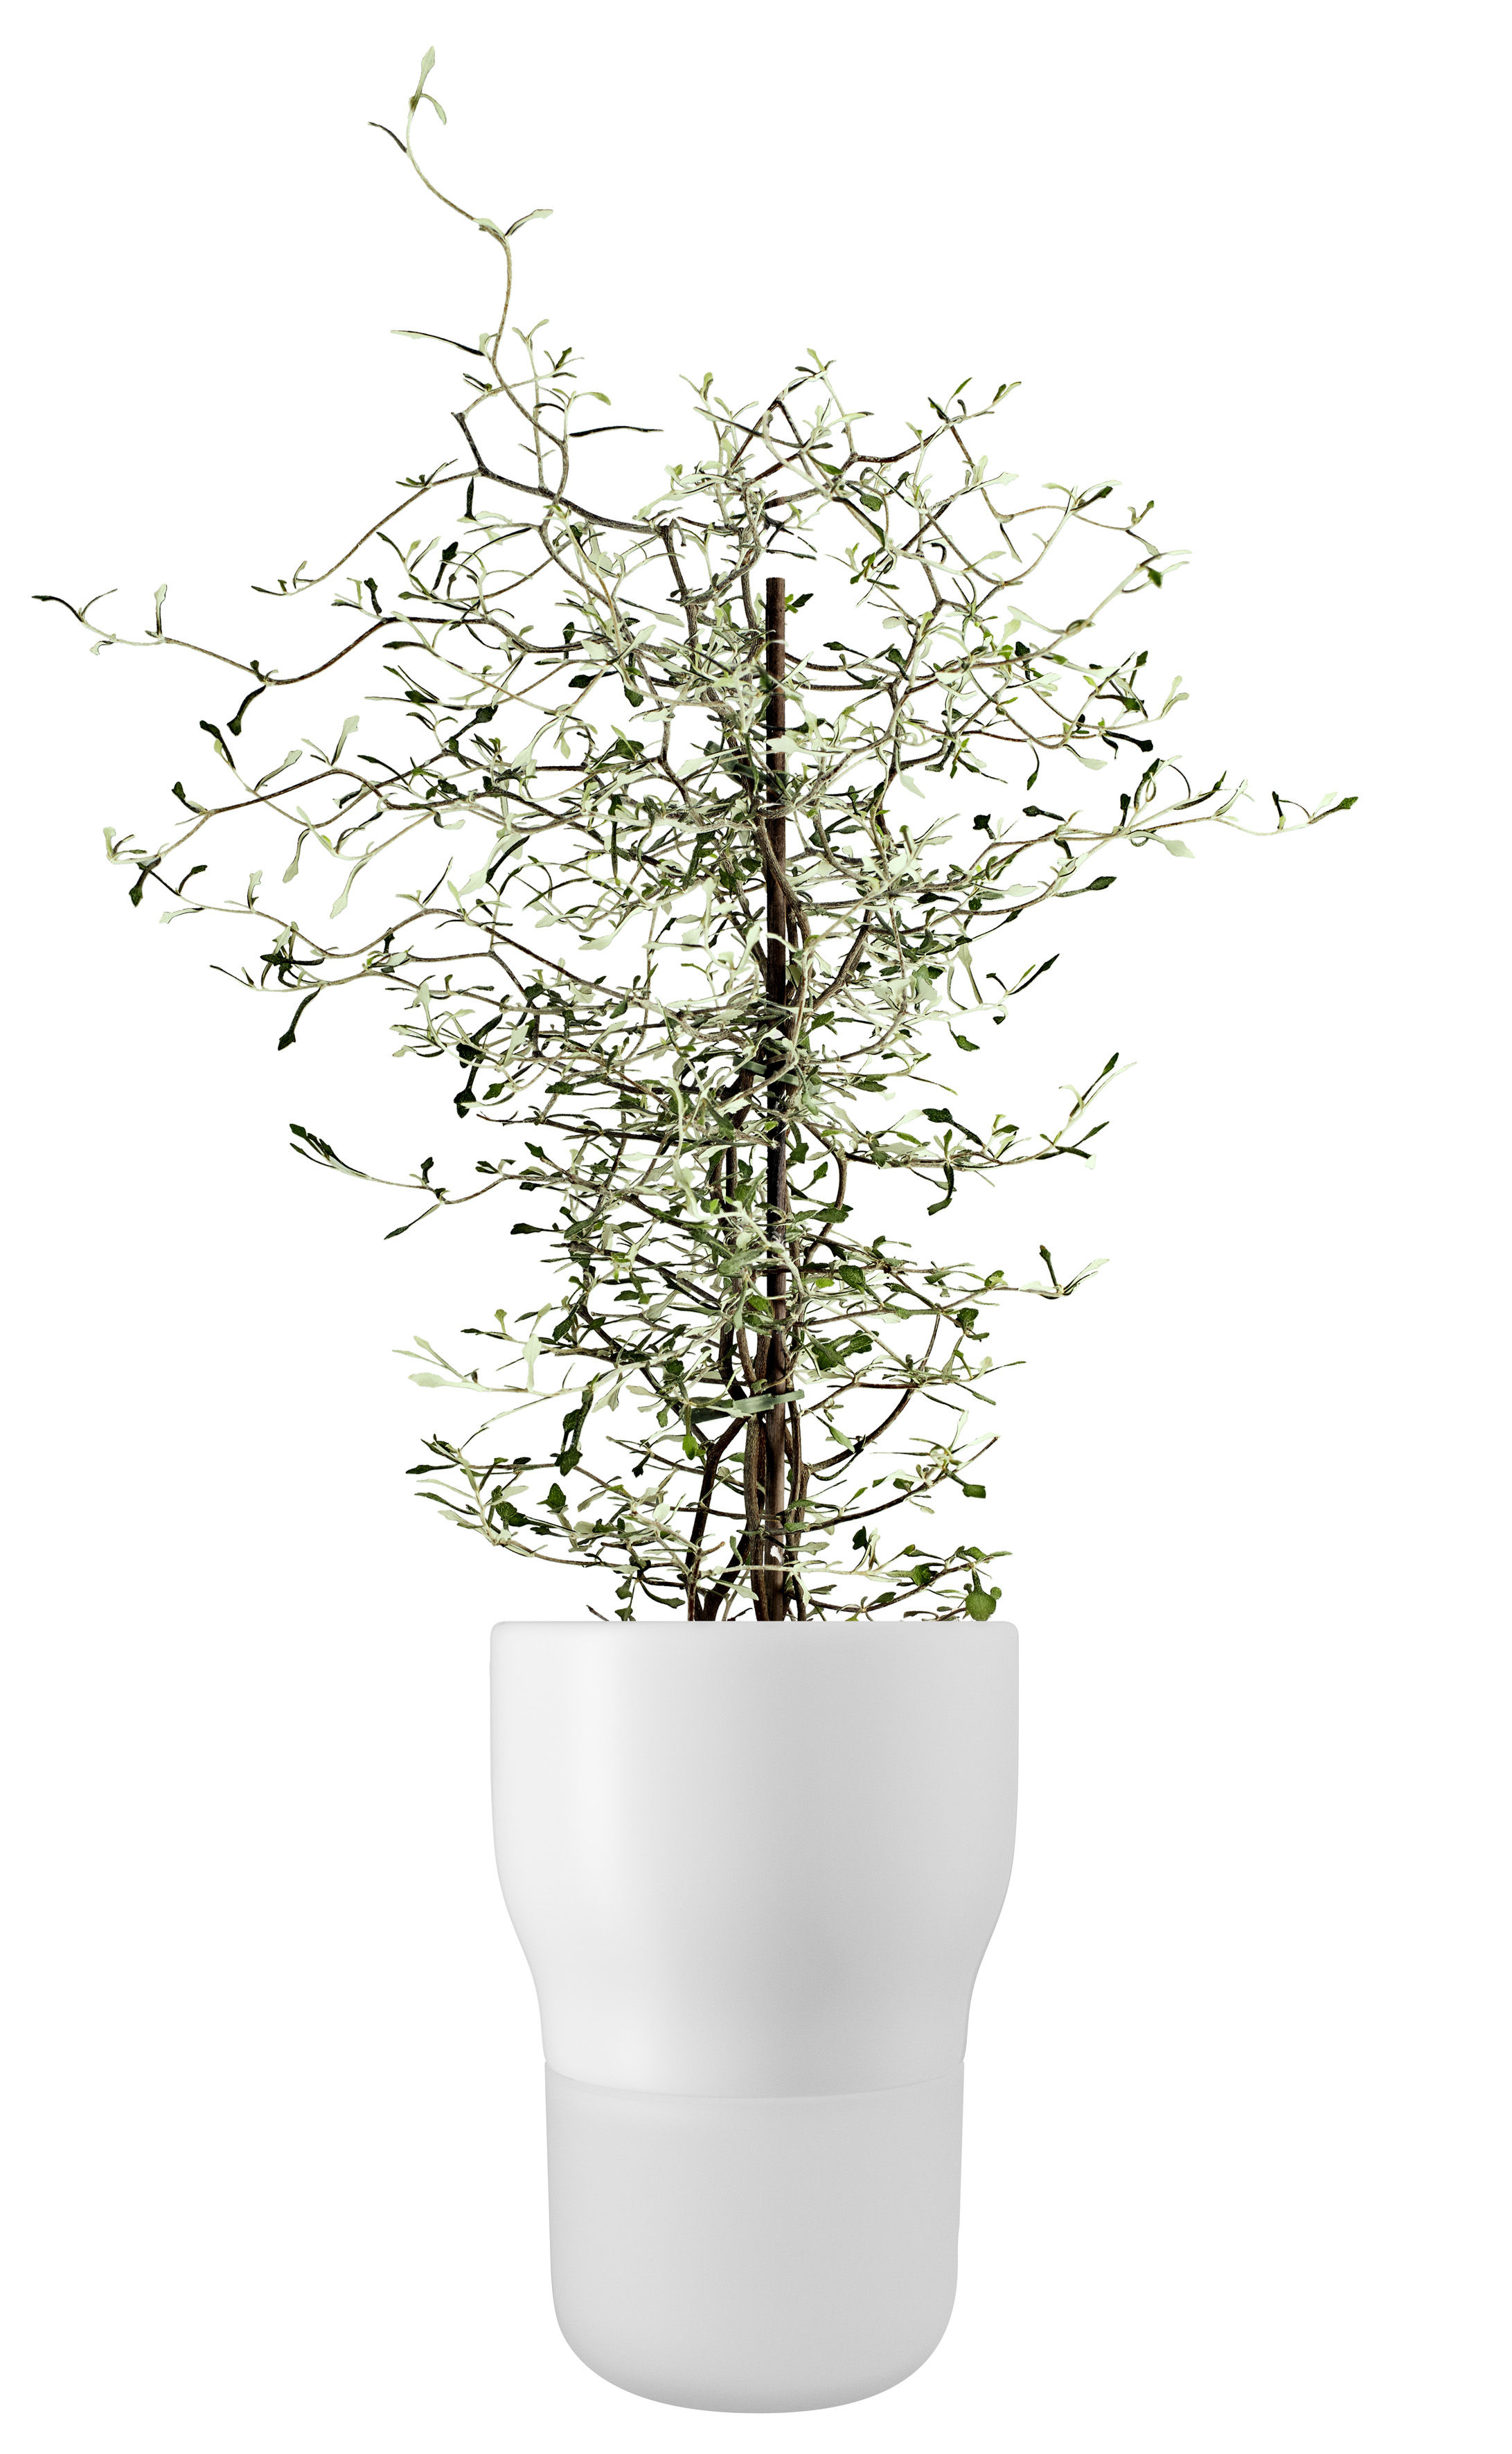 Decoration - Flower Pots & House Plants - Pot water storage - Large - Ø 13 x H 18 cm by Eva Solo - Chalk white - Ceramic, Hand blown frosted glass